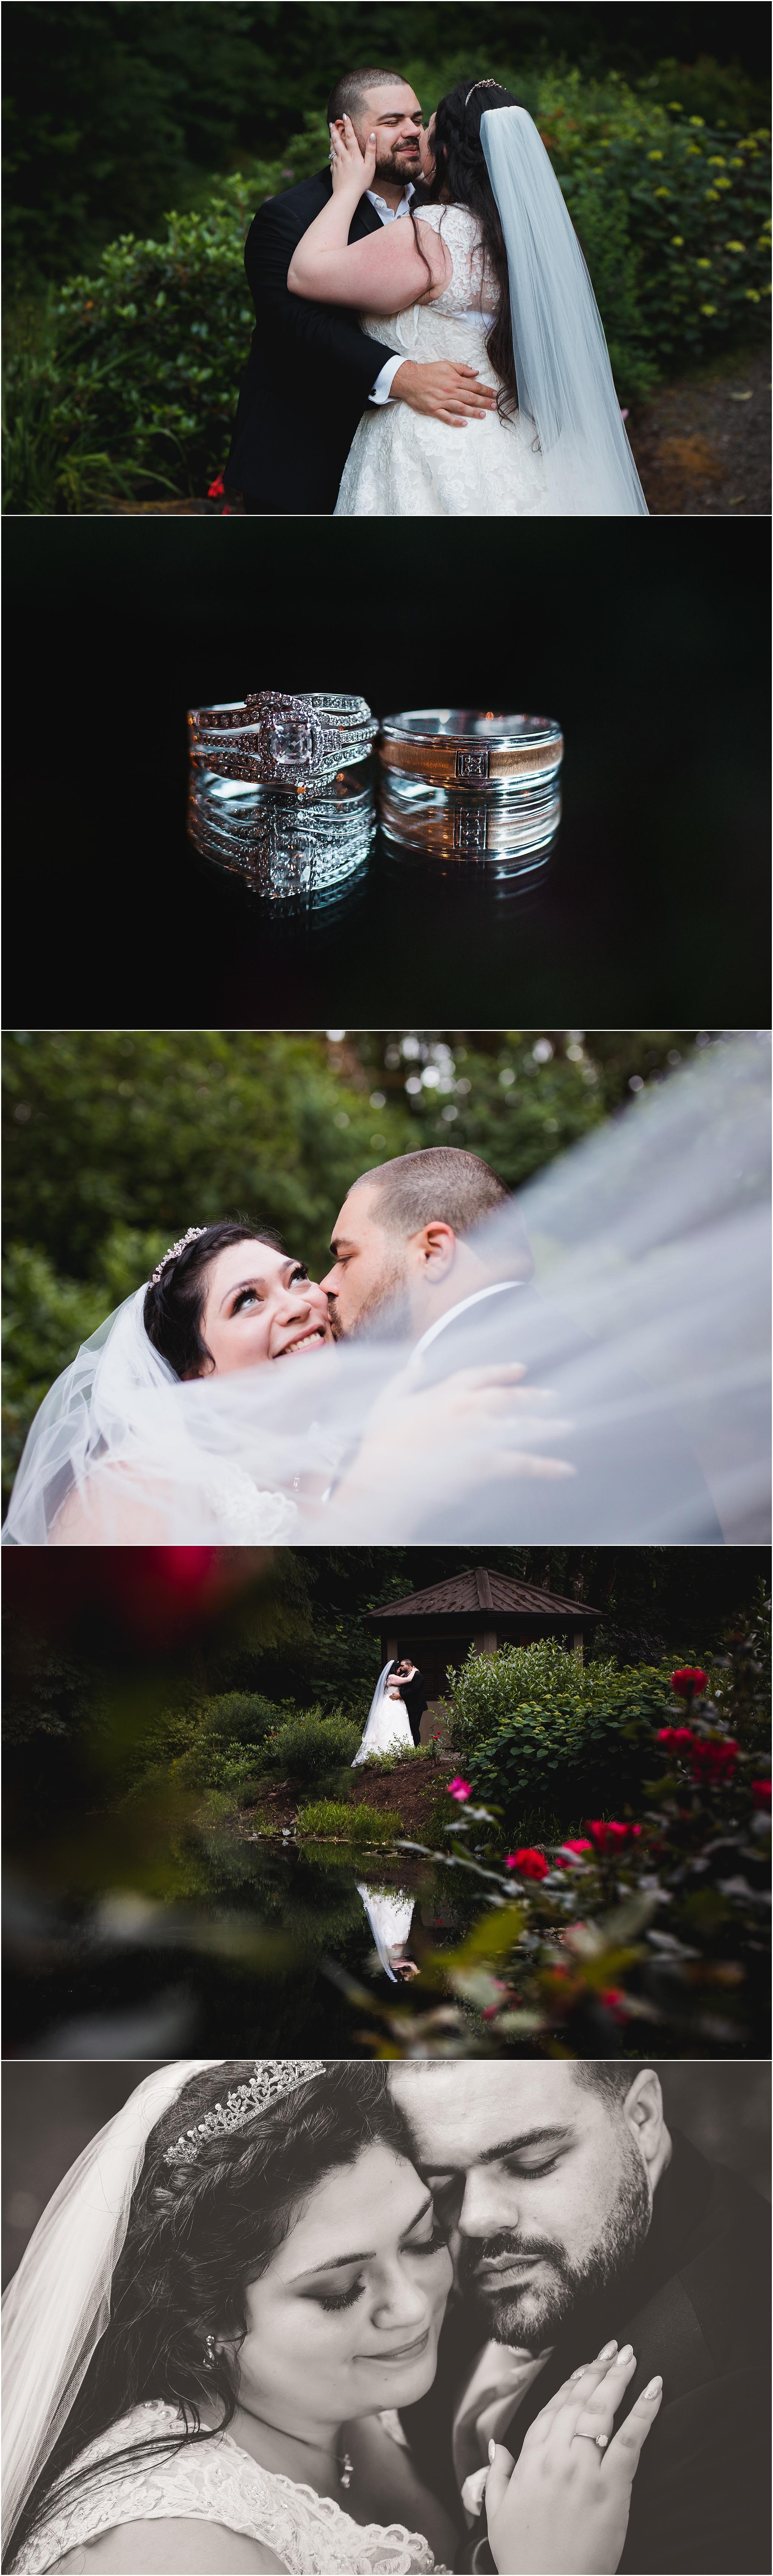 oregon_wedding_photographer_christina_louise_photography.jpg